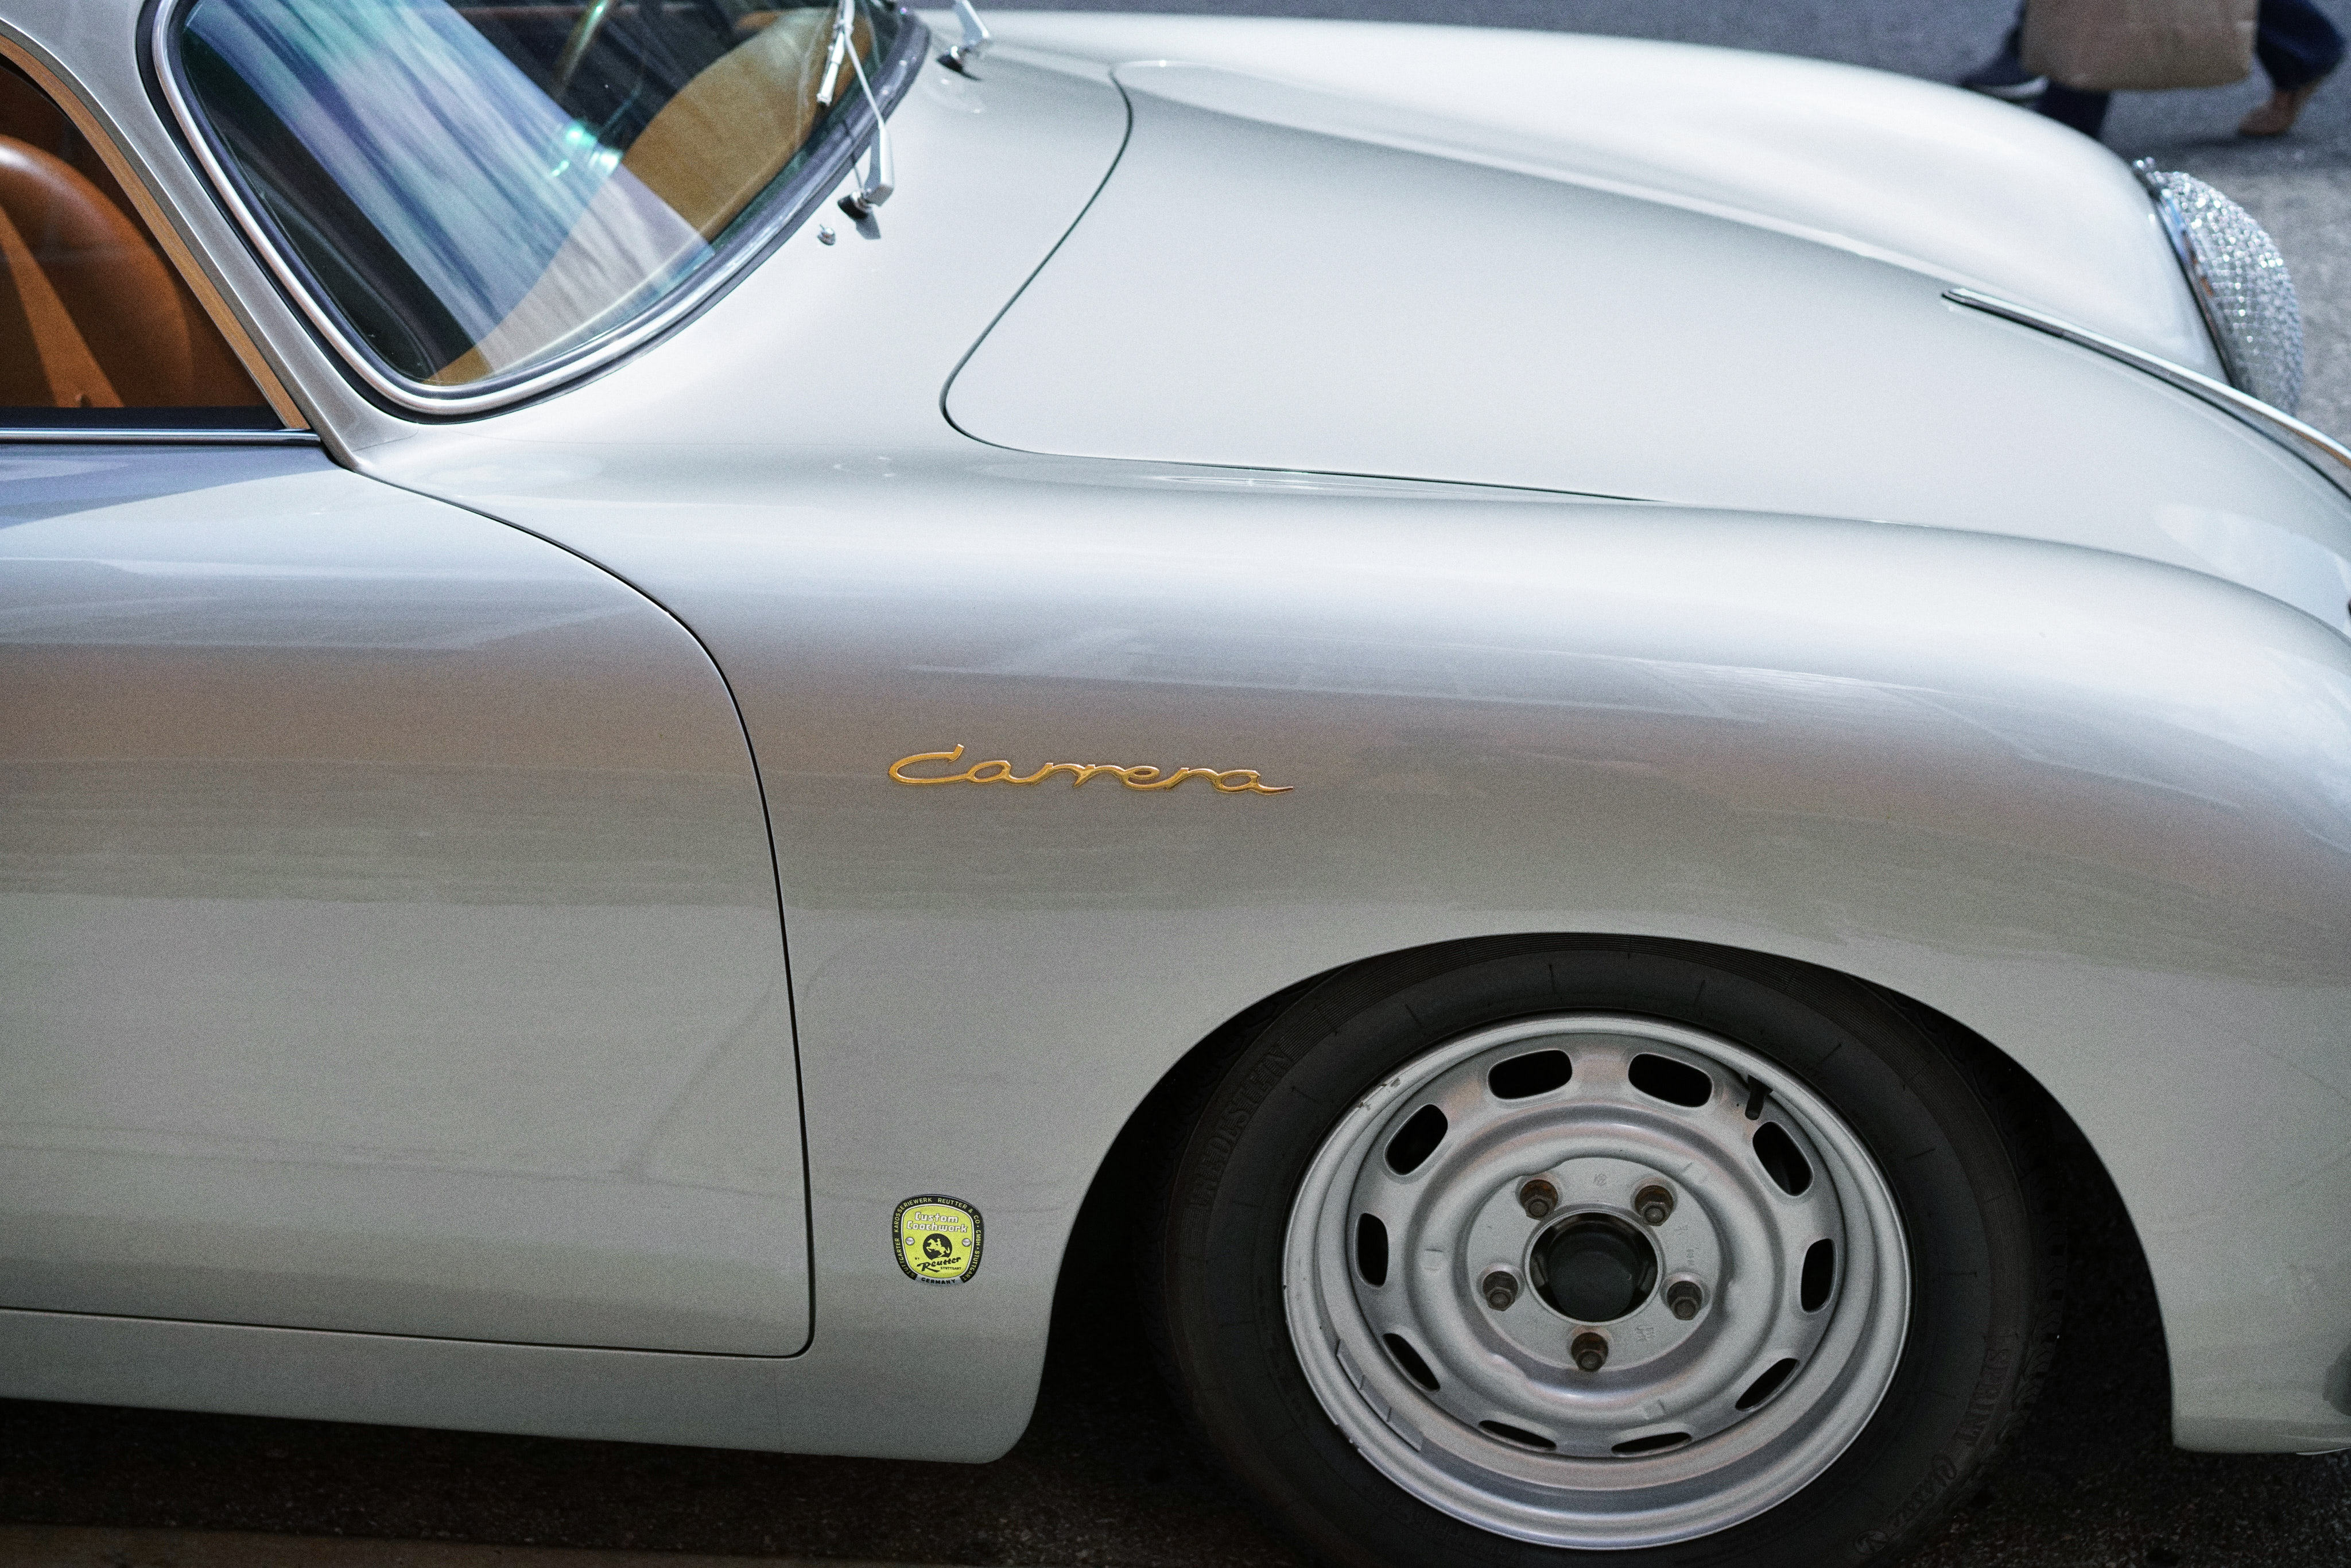 Luftgekühlt-6-Rennen-56-Porsche-356-1956-Carrera-Wing-Detail